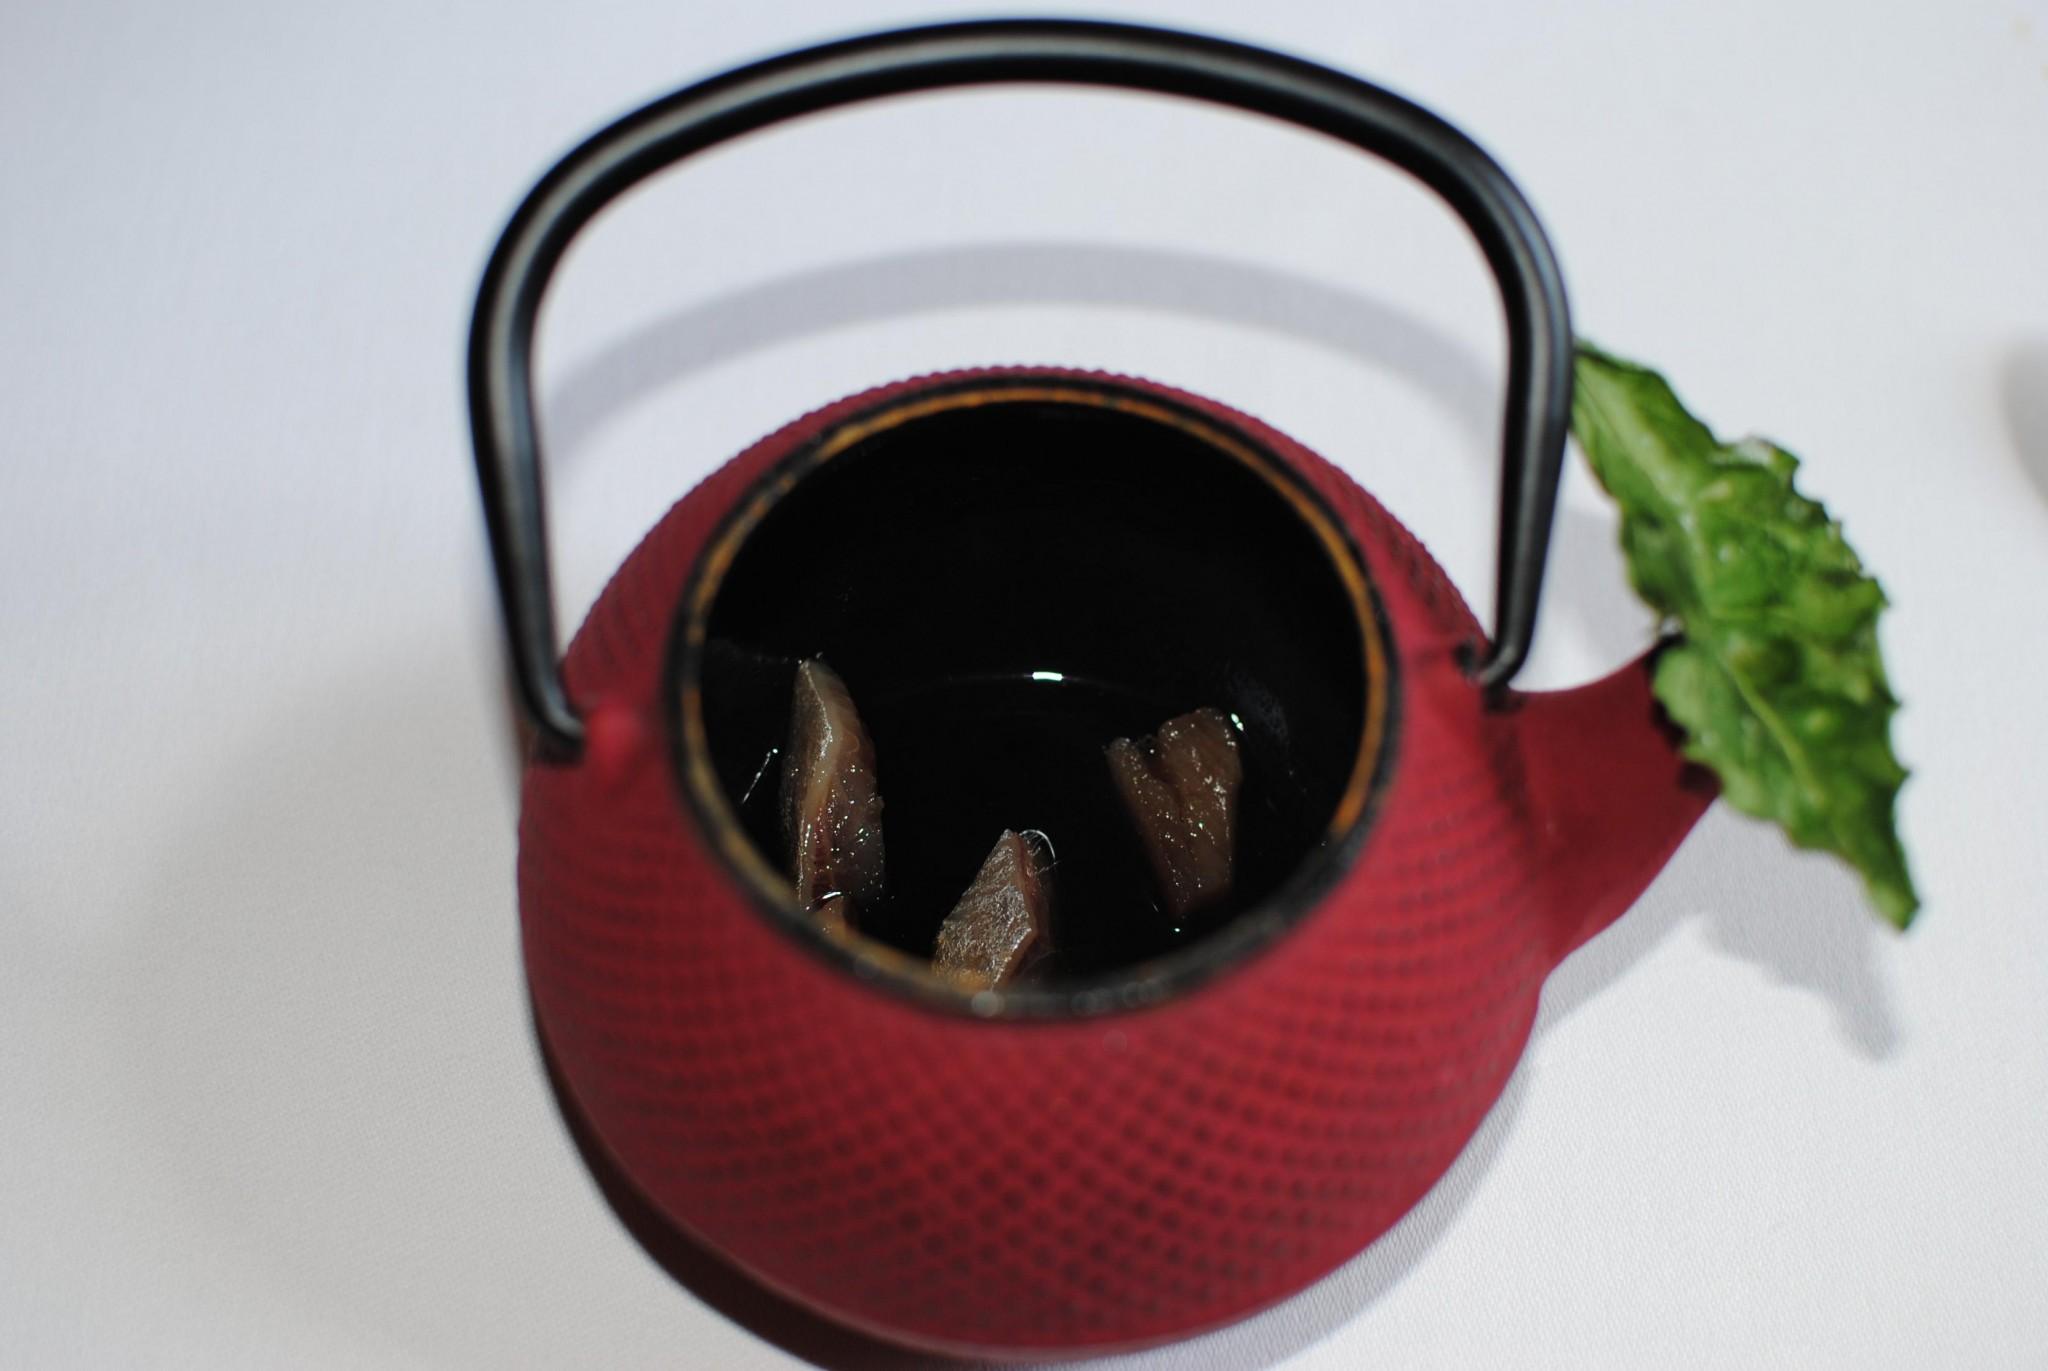 Sardinaahumada; PX y hojadeacelgamarina_red